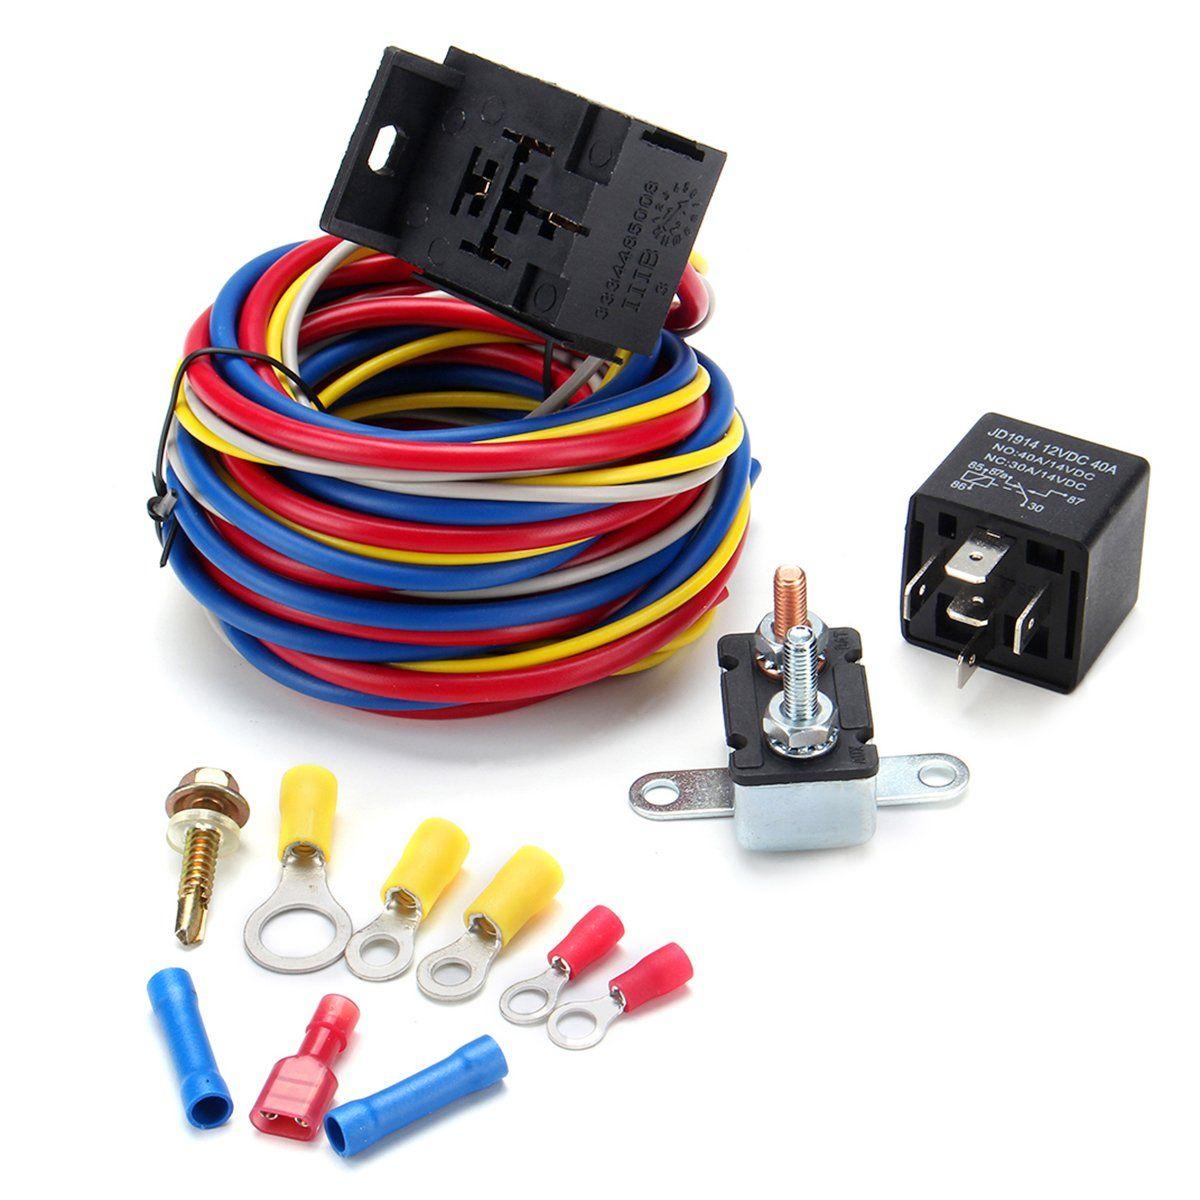 electric cooling fan wire harness kit relay circuit breaker wiring harness sbc sbf 302 350 454 [ 1200 x 1200 Pixel ]